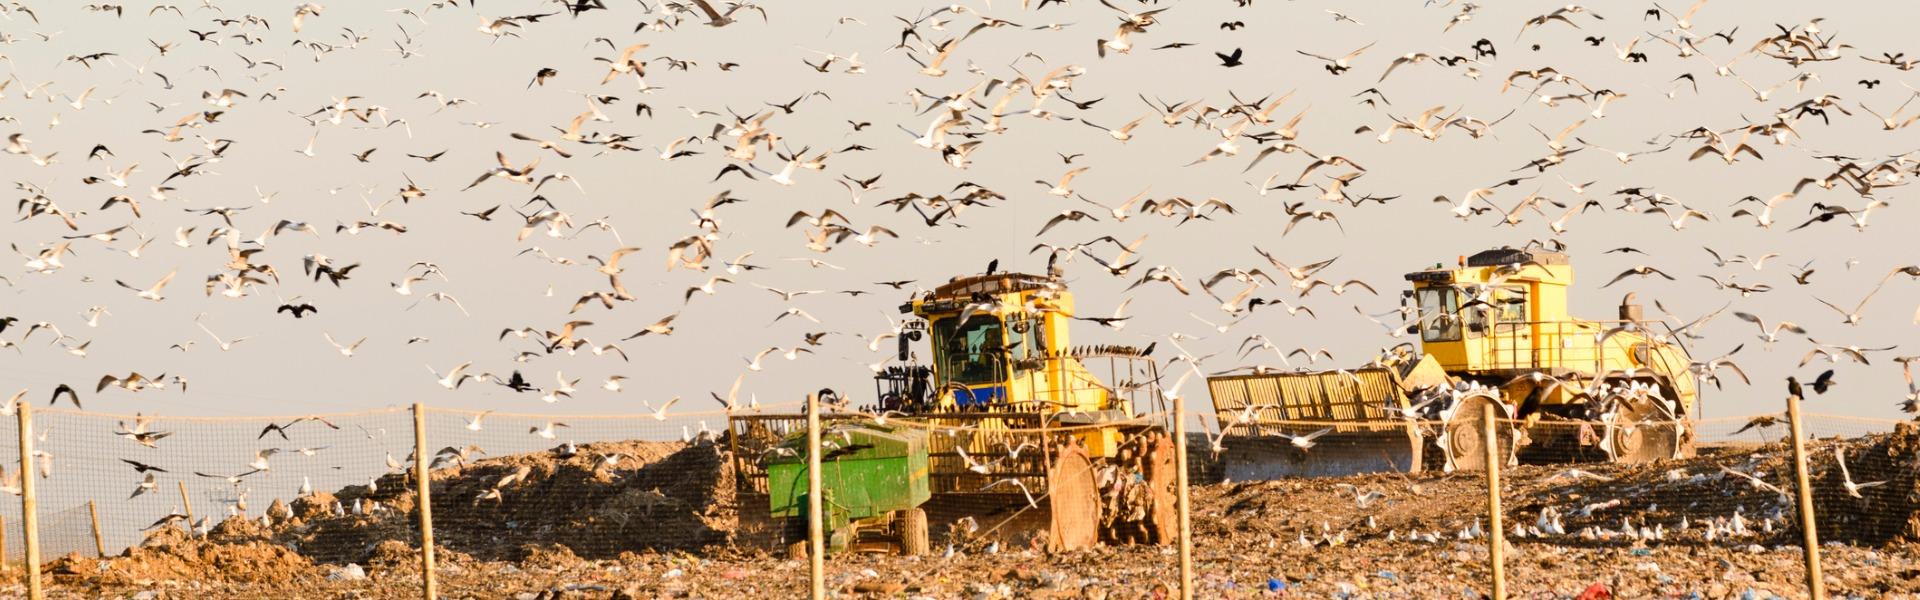 Prevent Landfill